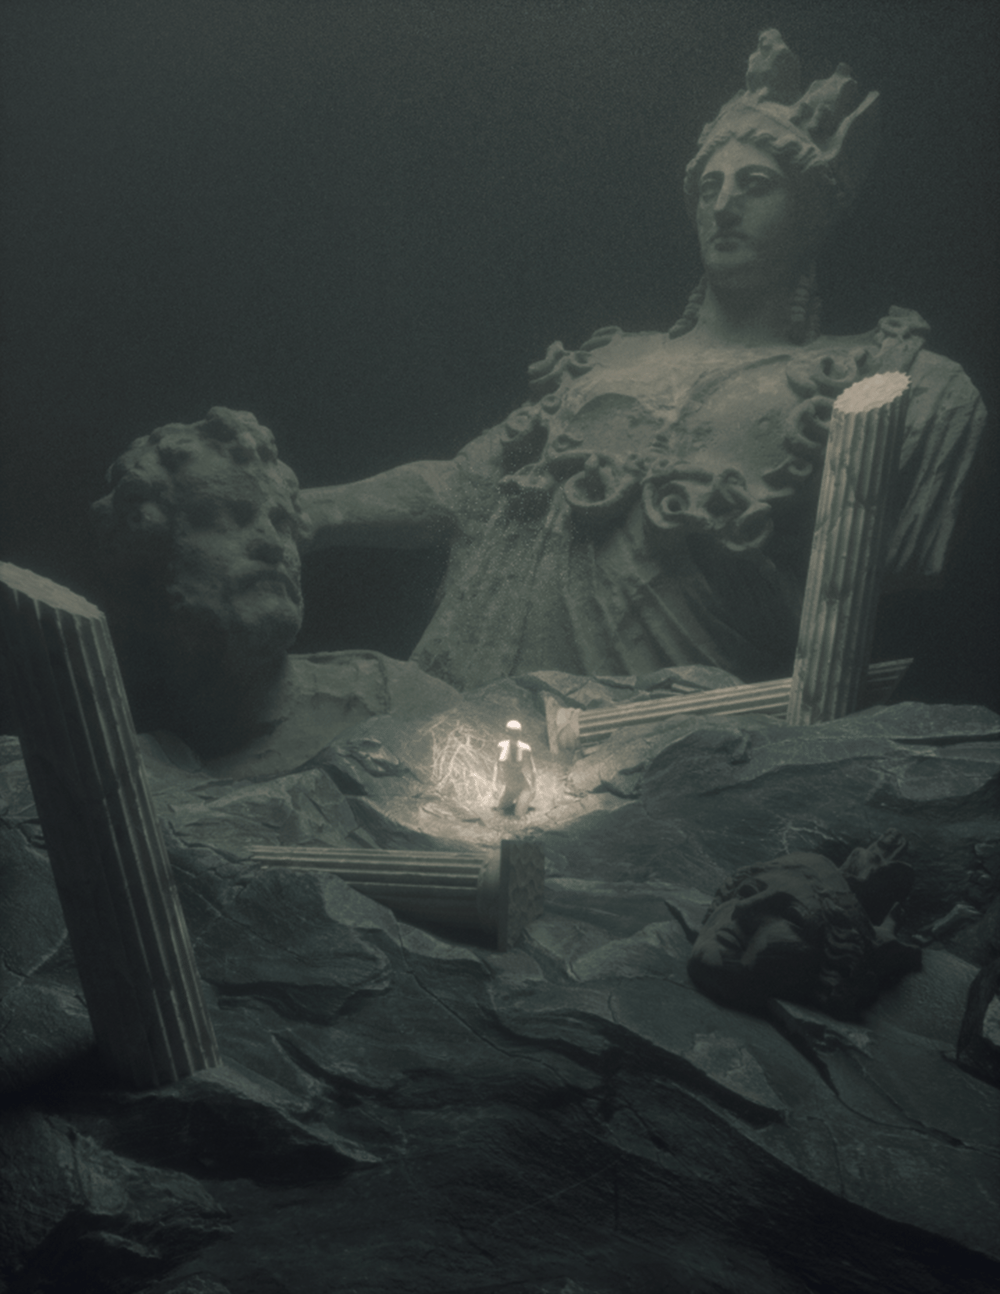 Annihilation - image 1 - student project